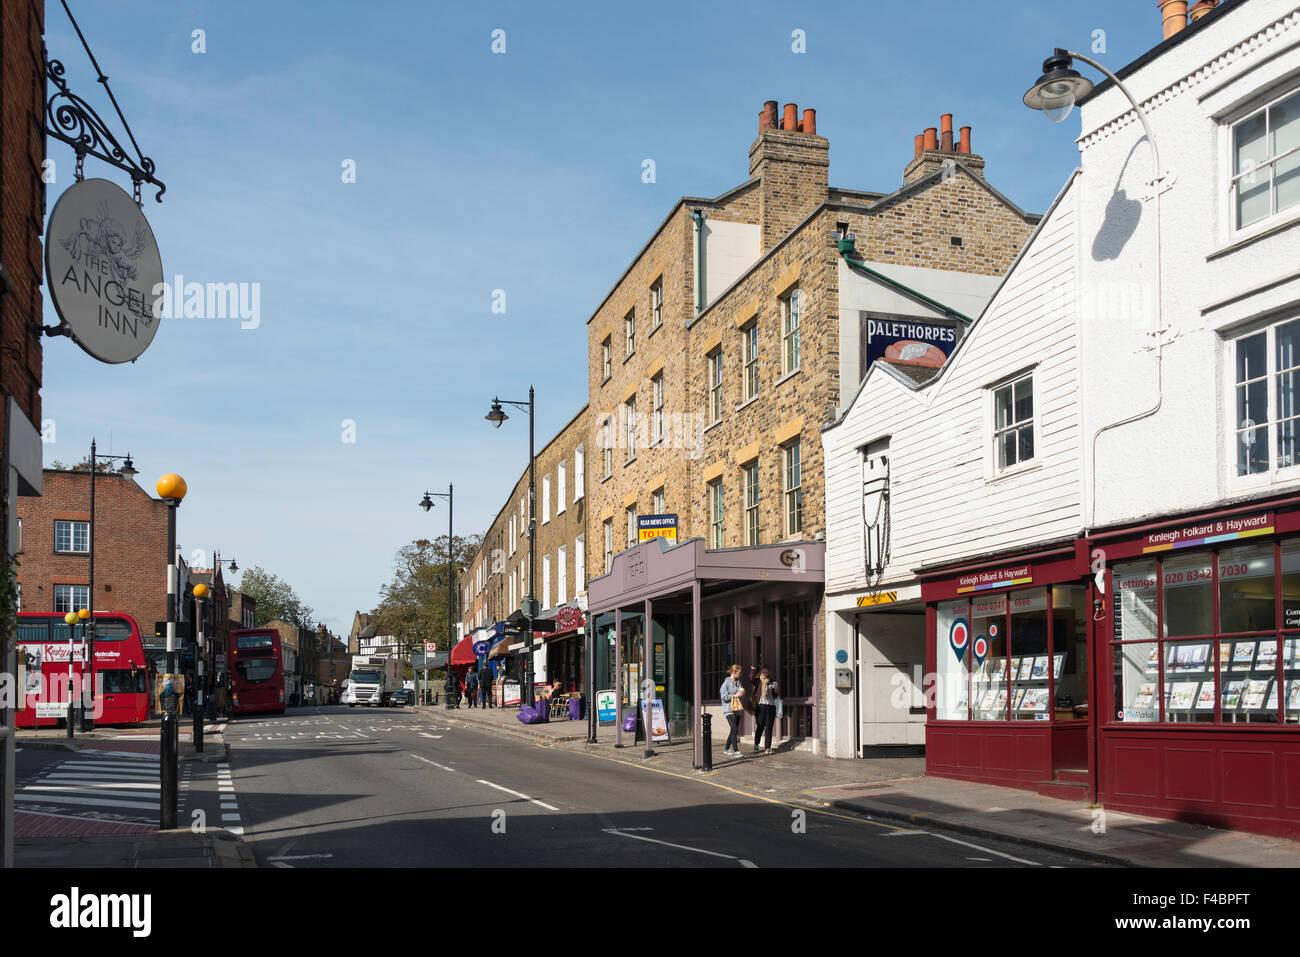 High Street, Highgate Village, Highgate, London Borough of Haringey, Greater London, England, United Kingdom - Stock Image